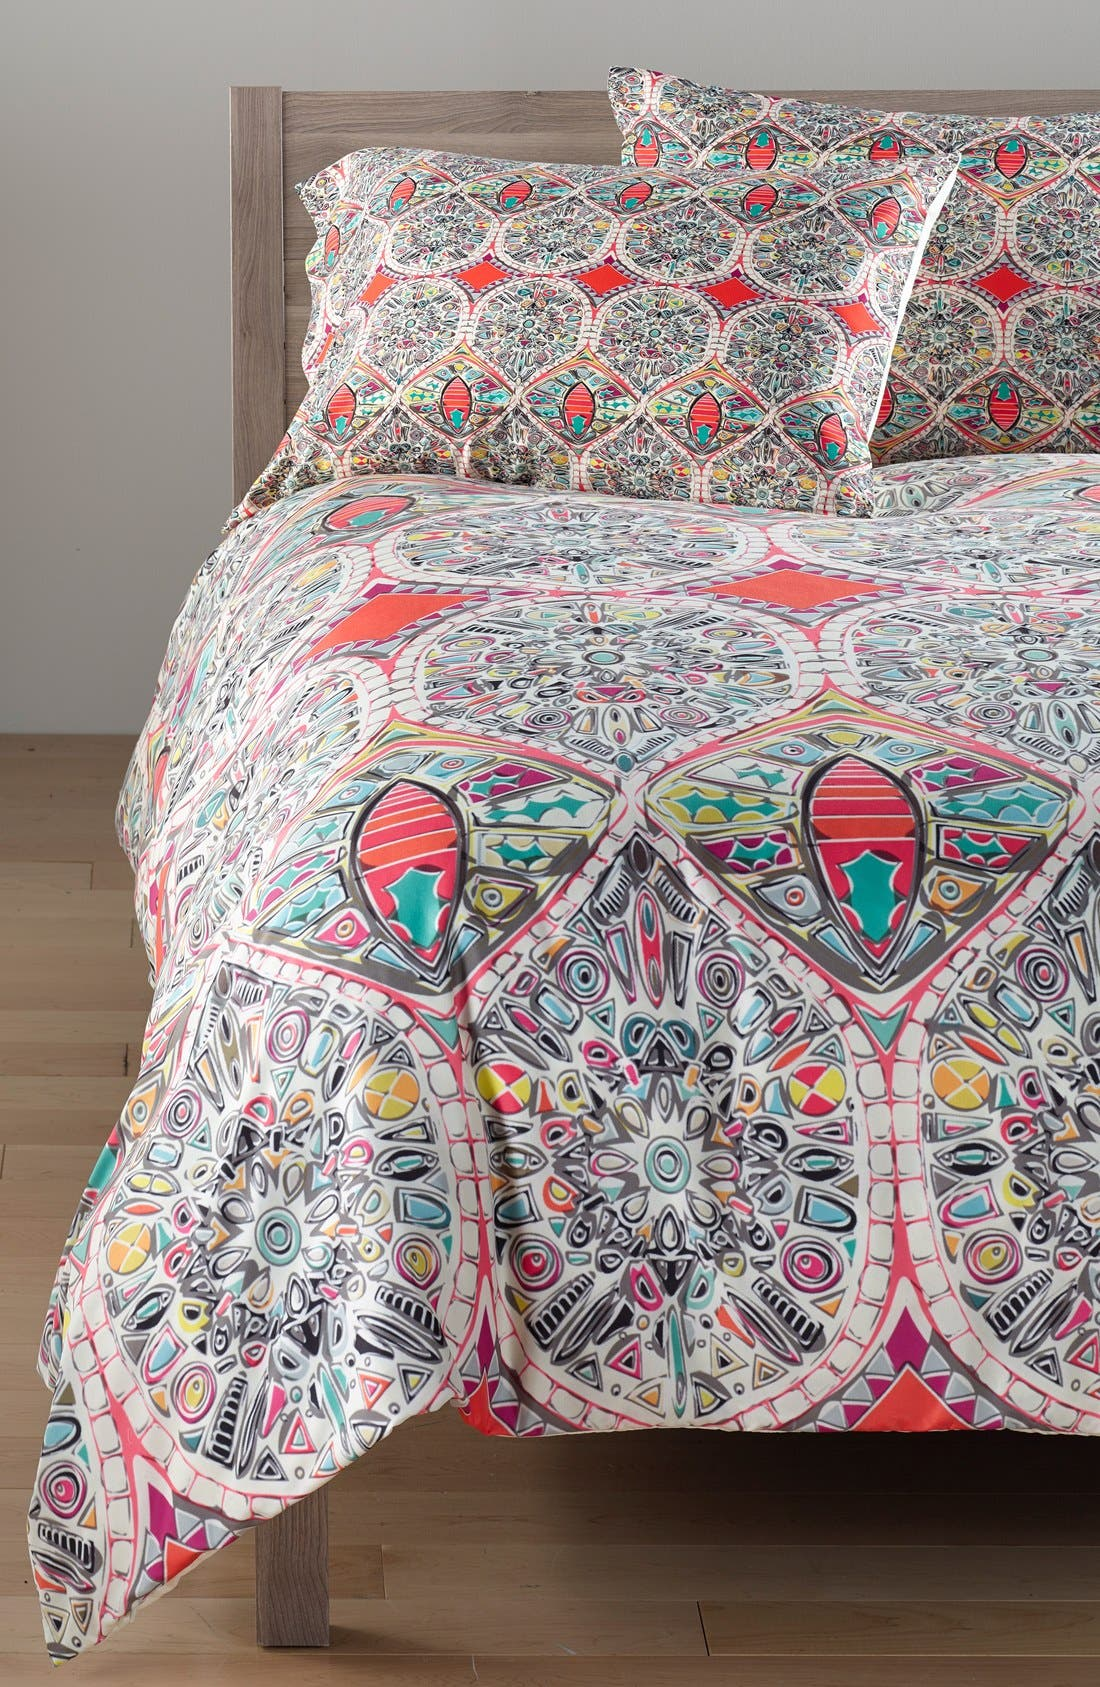 Alternate Image 1 Selected - DENY Designs Sharon Turner Holly Duvet Cover & Sham Set